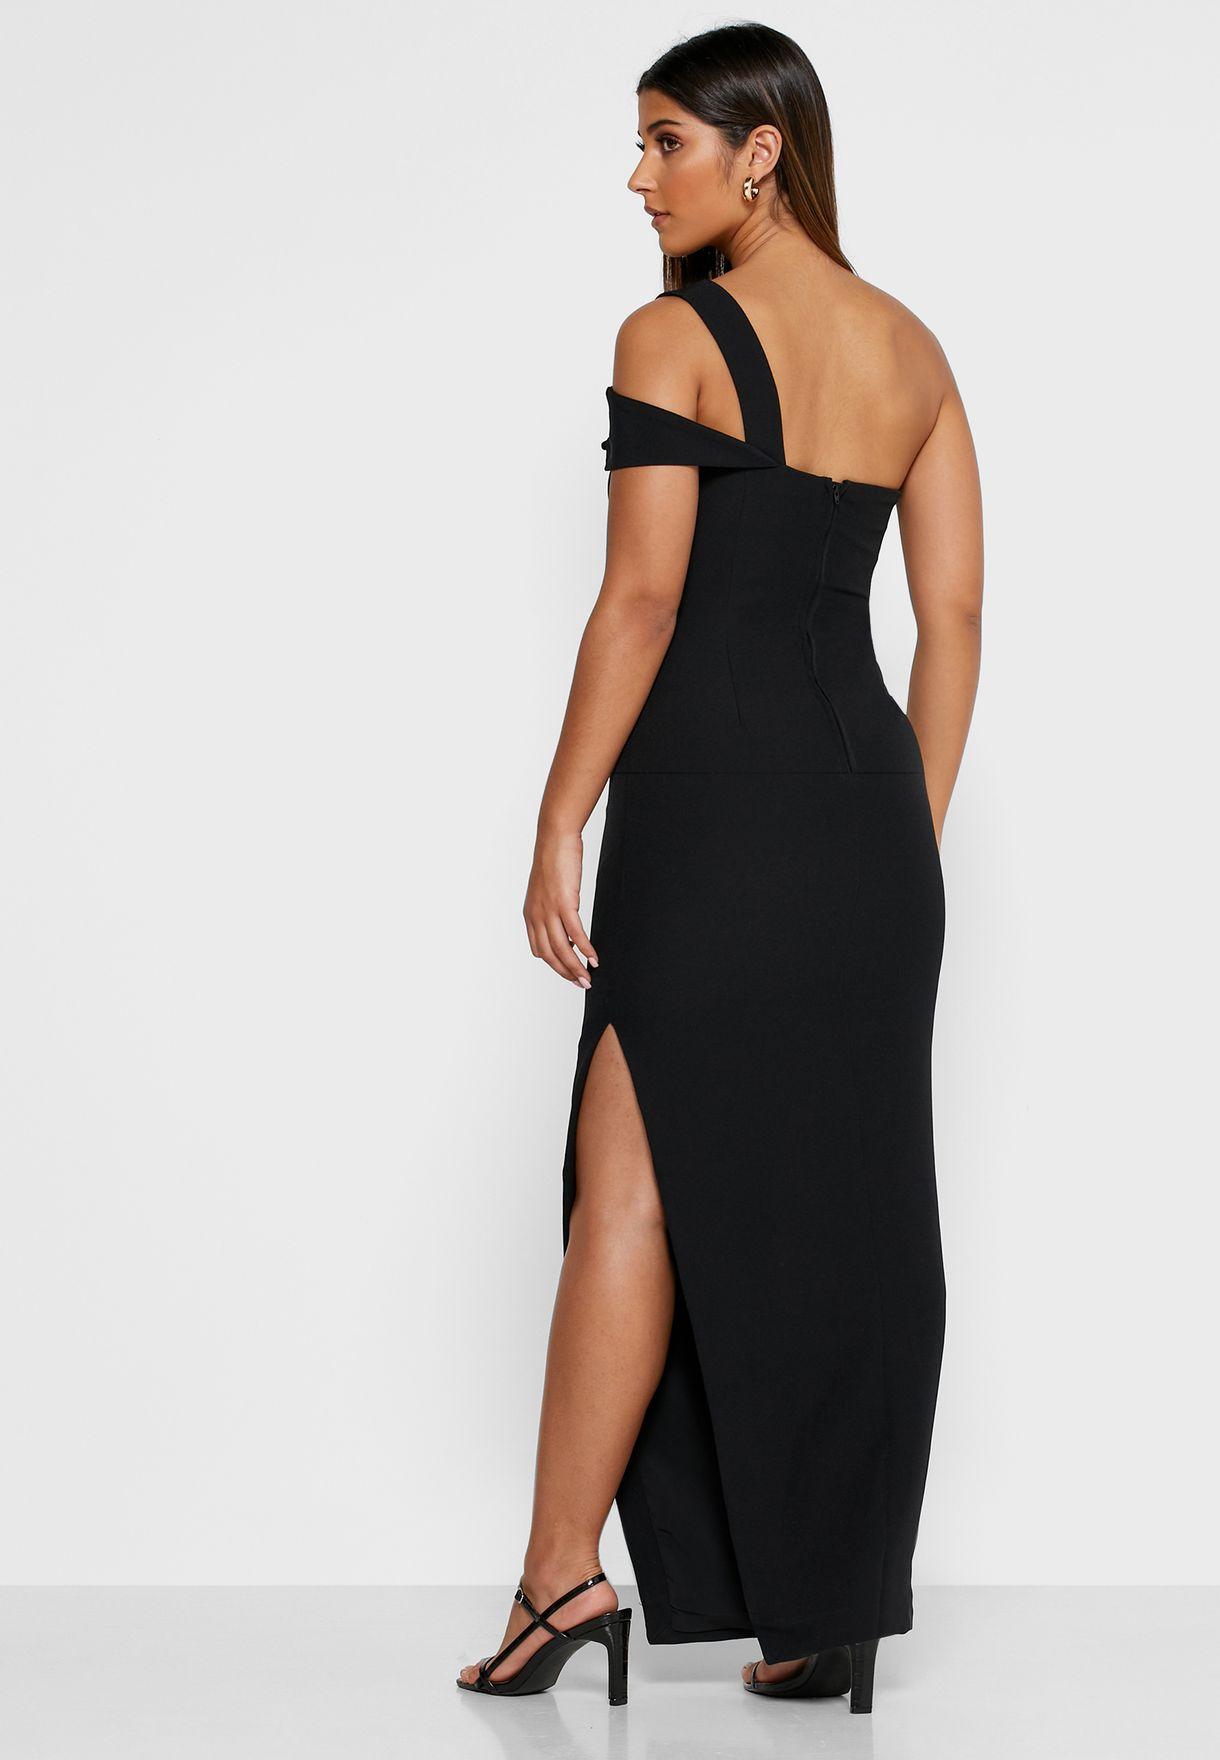 فستان عصري بكتف واحد